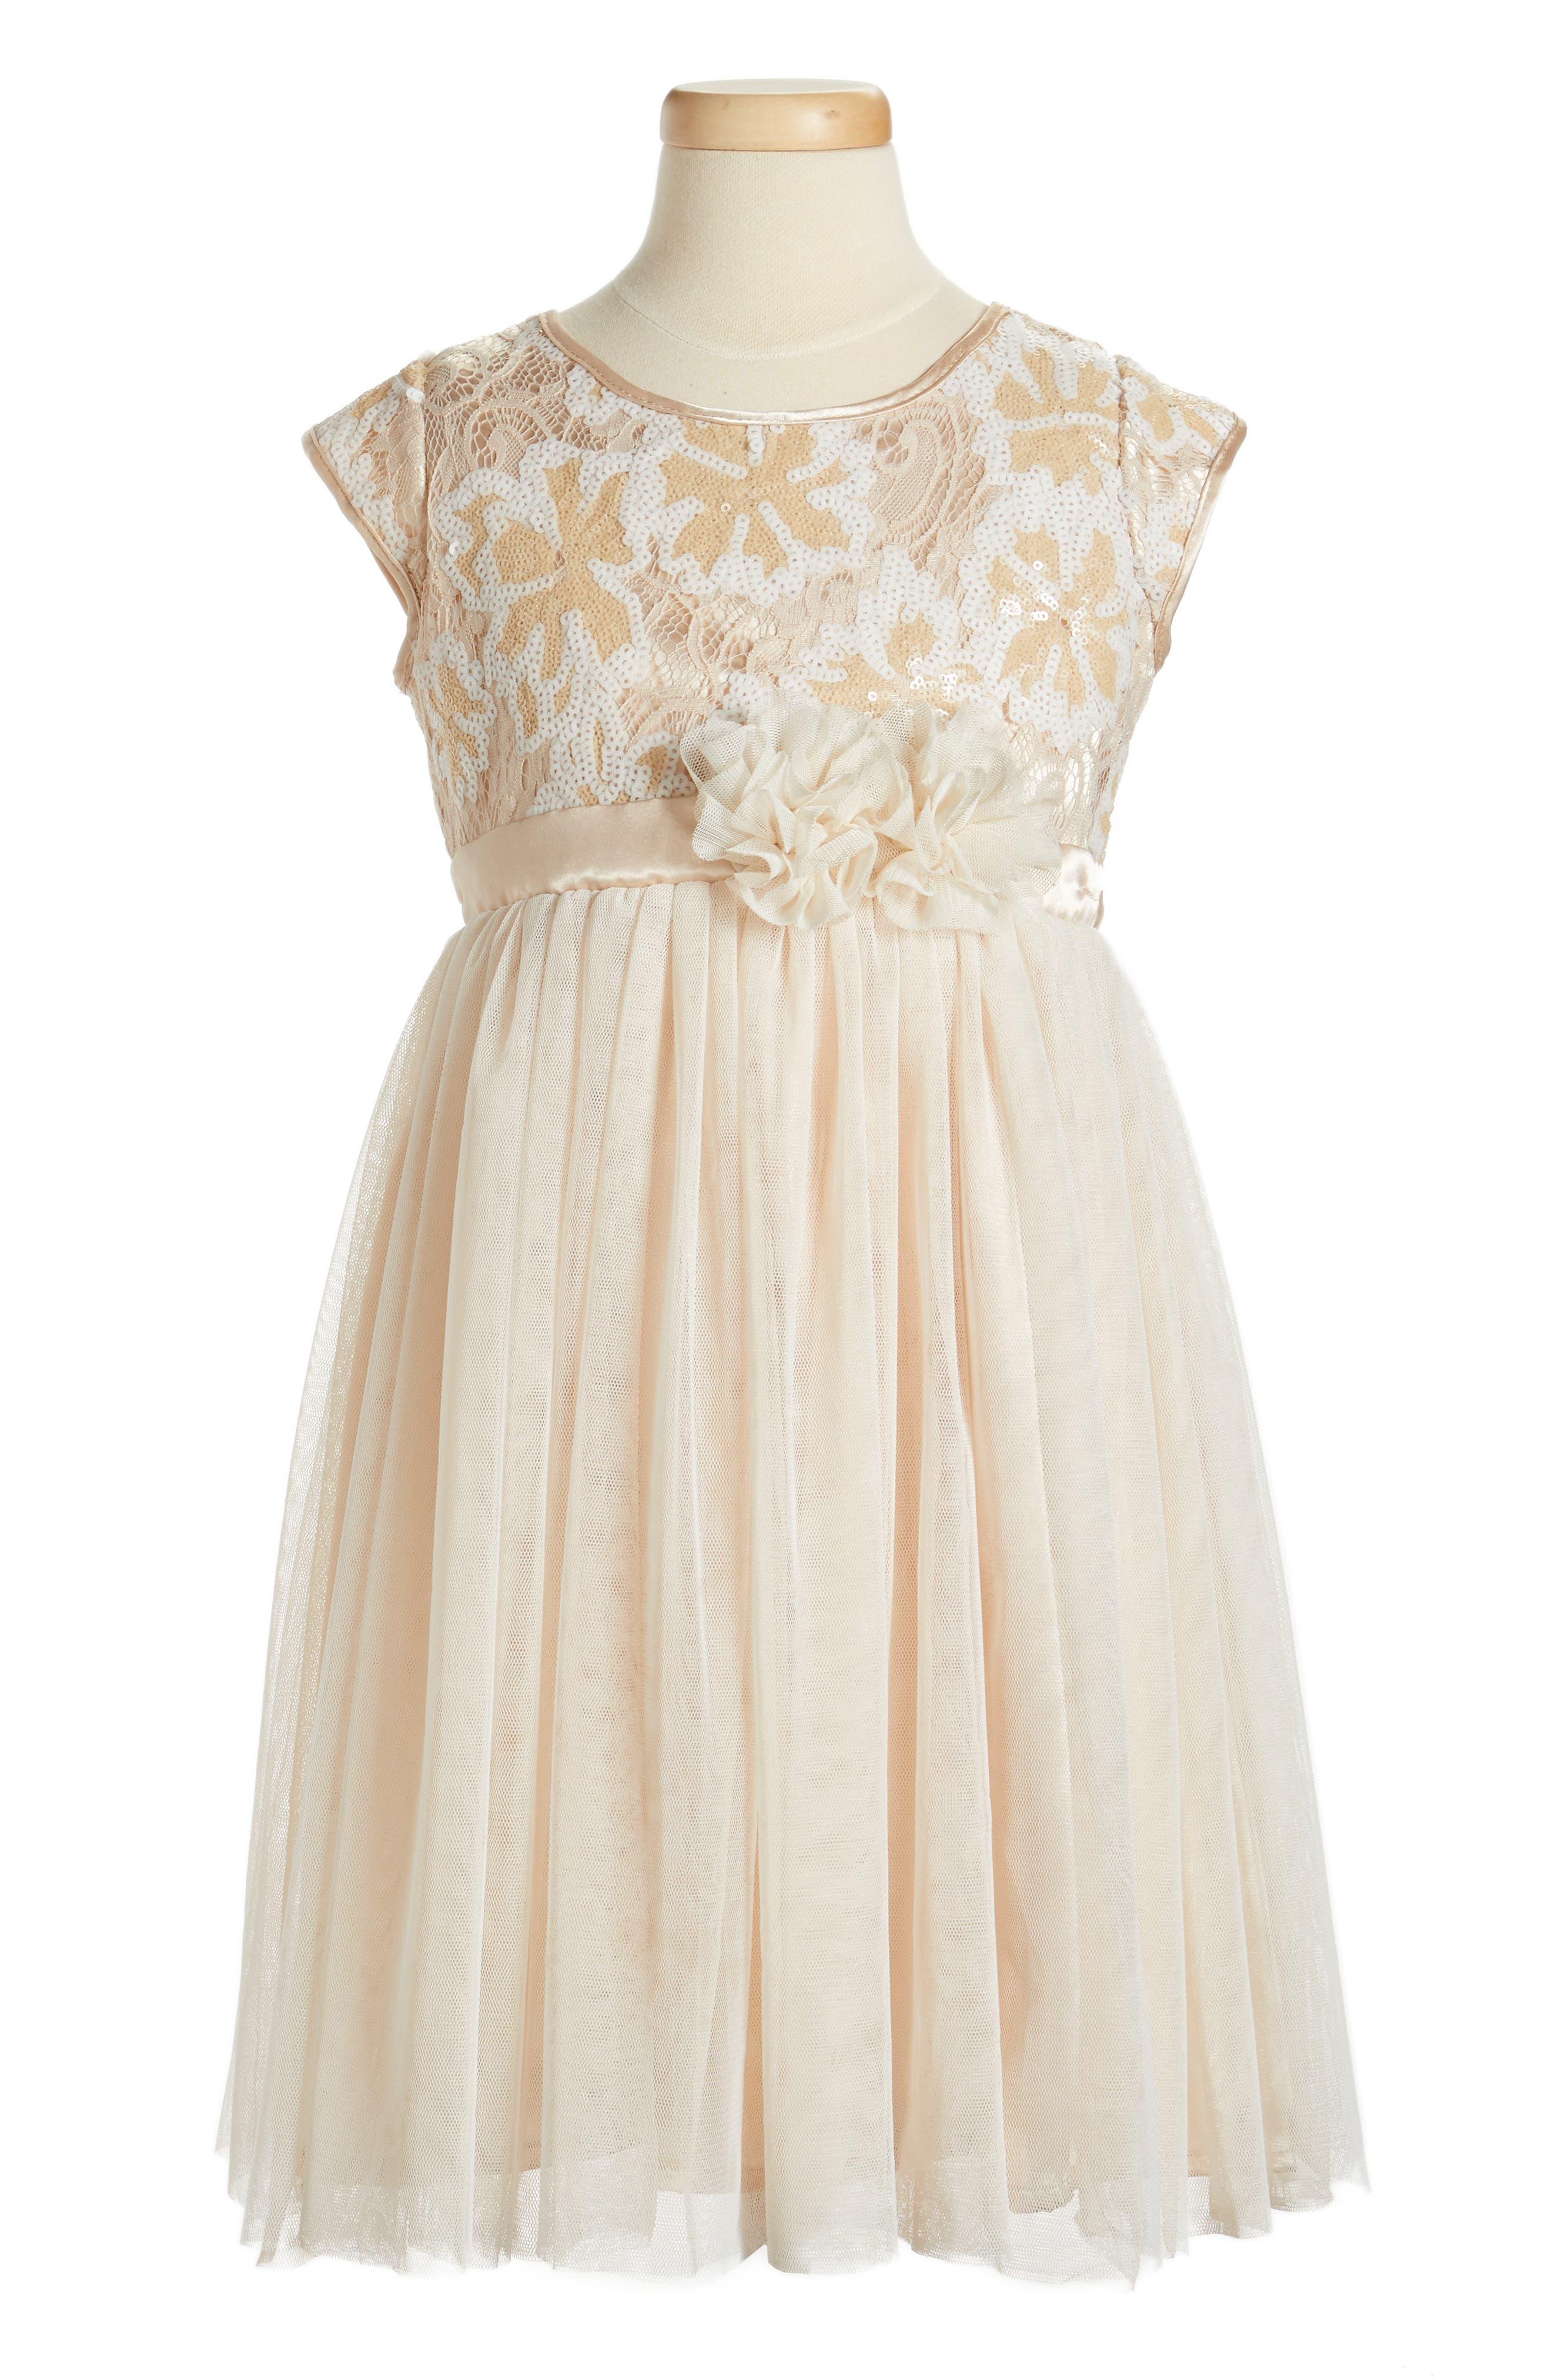 POPATU Sequin Flower Dress